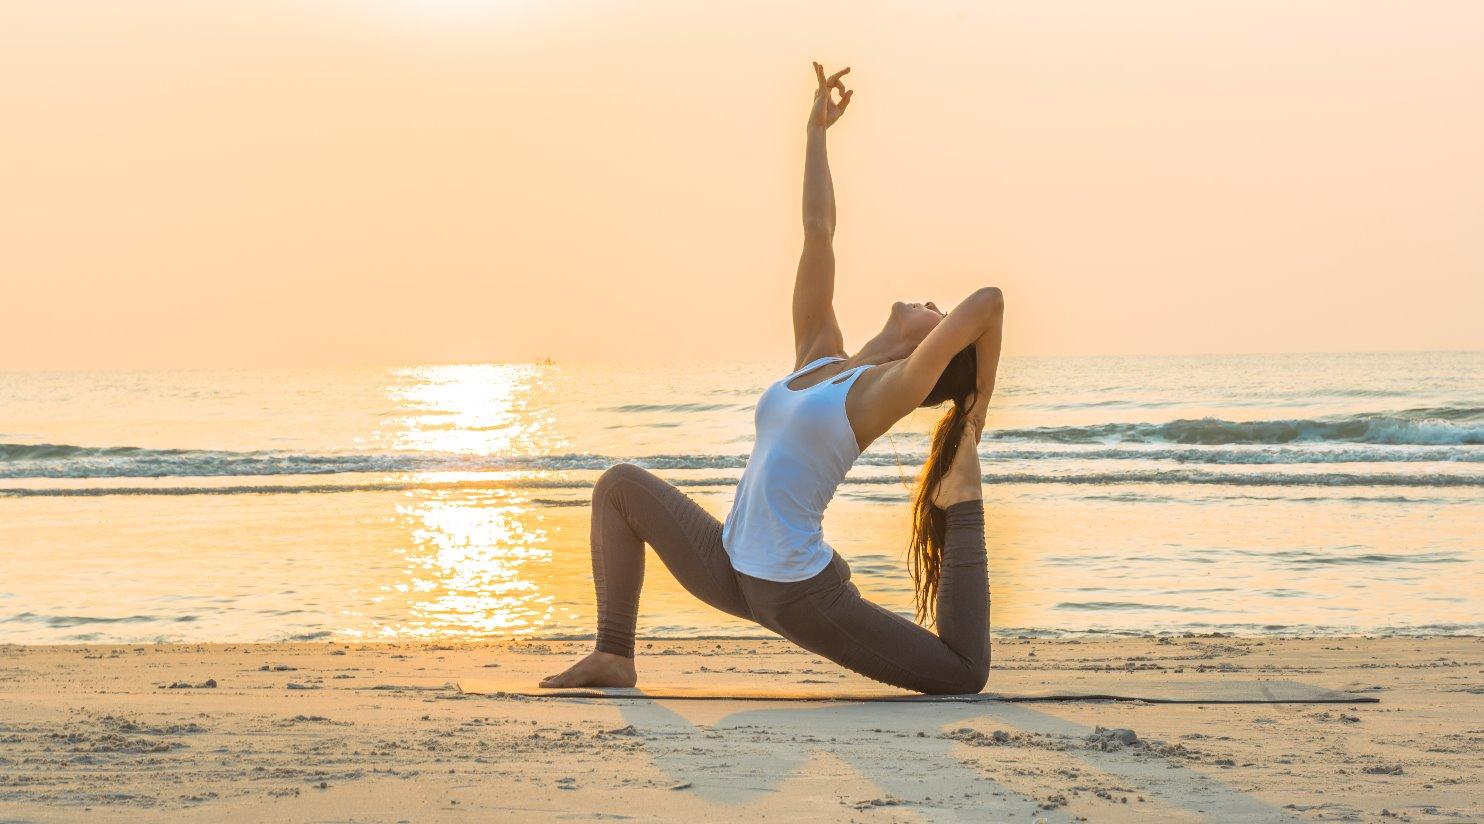 Luxury Yoga retreats in Ibiza